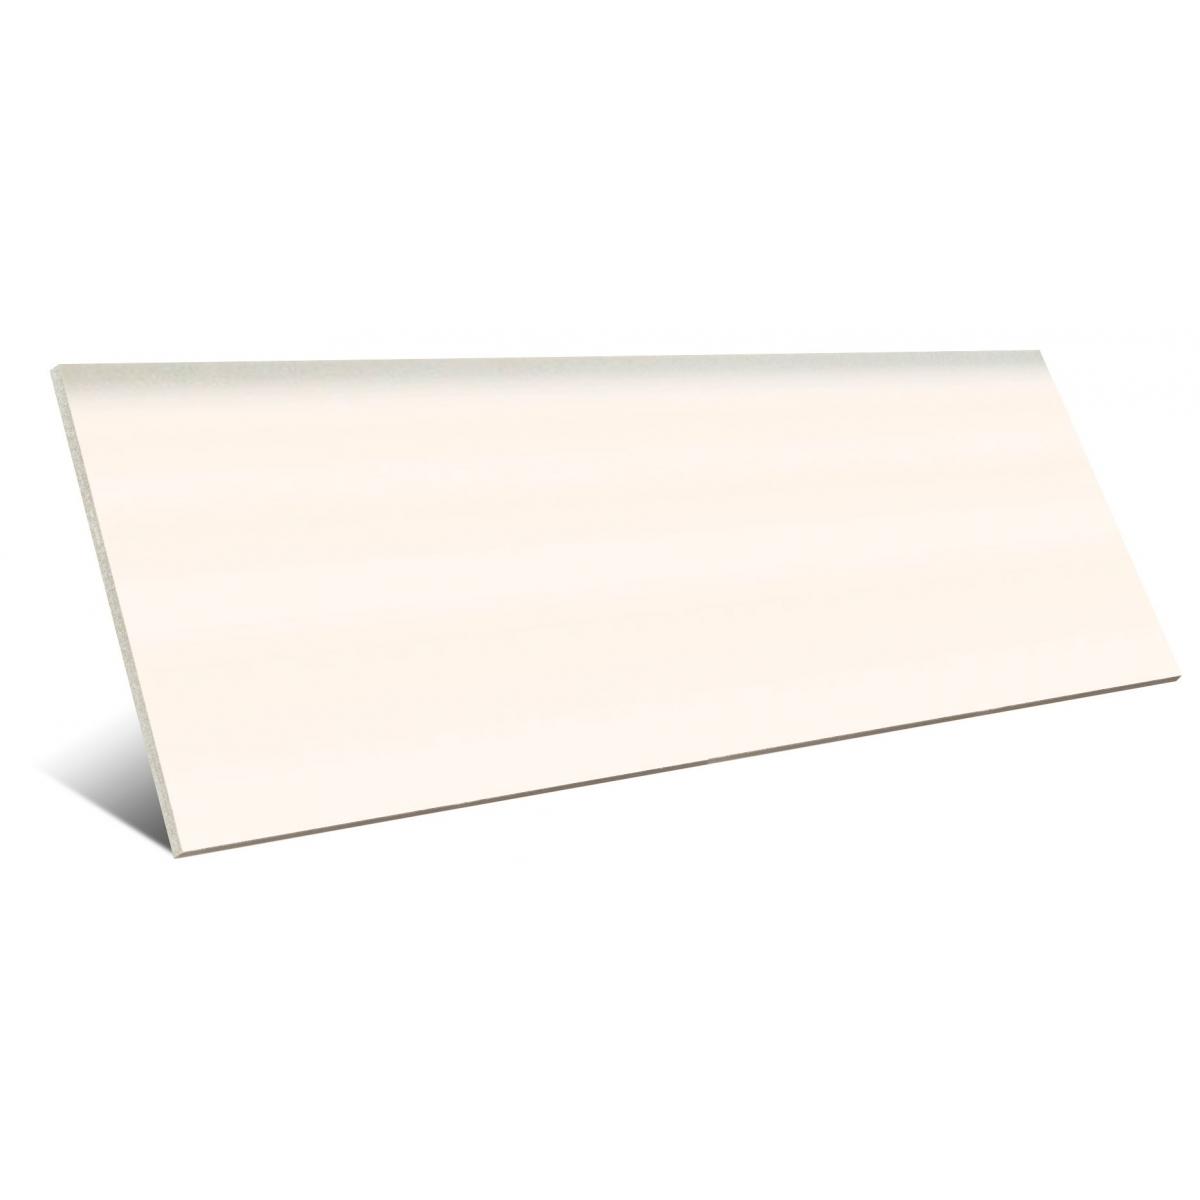 Rodapié Blanco Victorian 7,5x20 (ud)